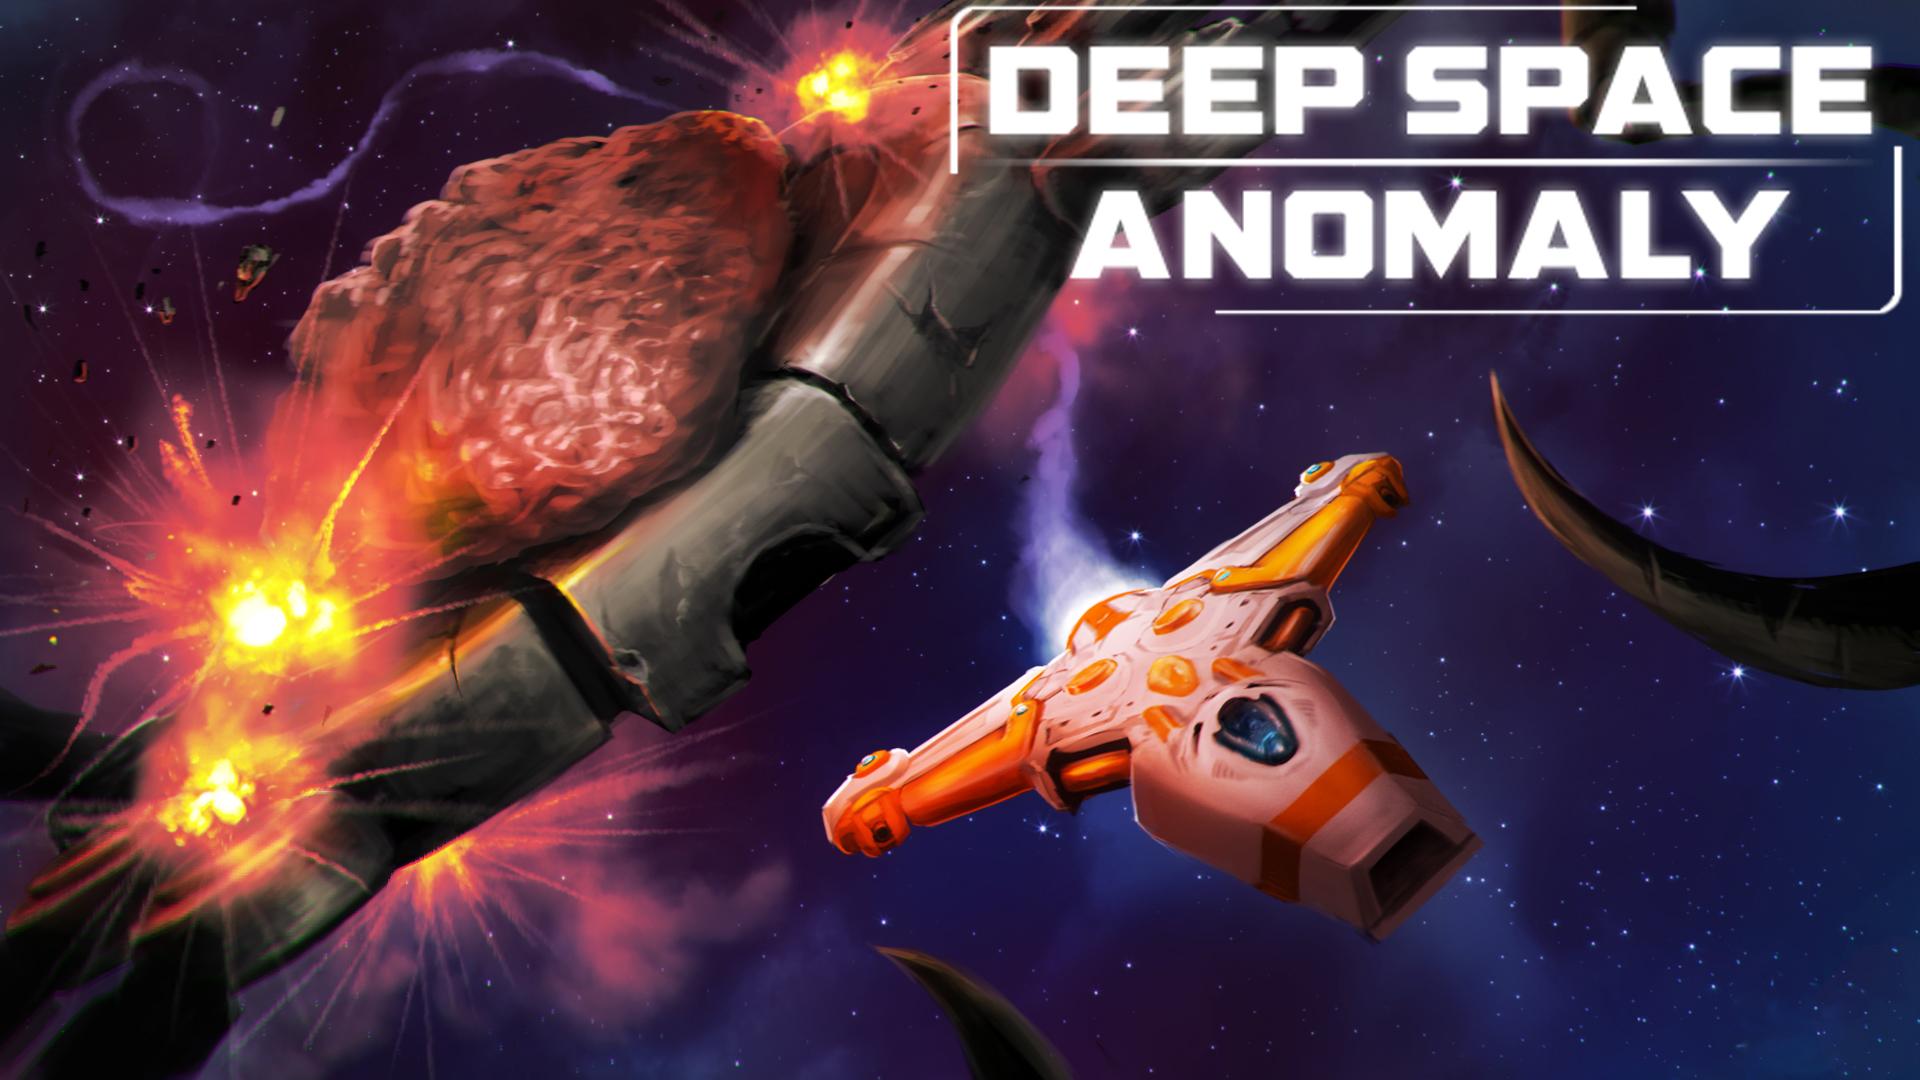 Халява: на PC бесплатно раздают космический экшен - Deep Space Anomaly